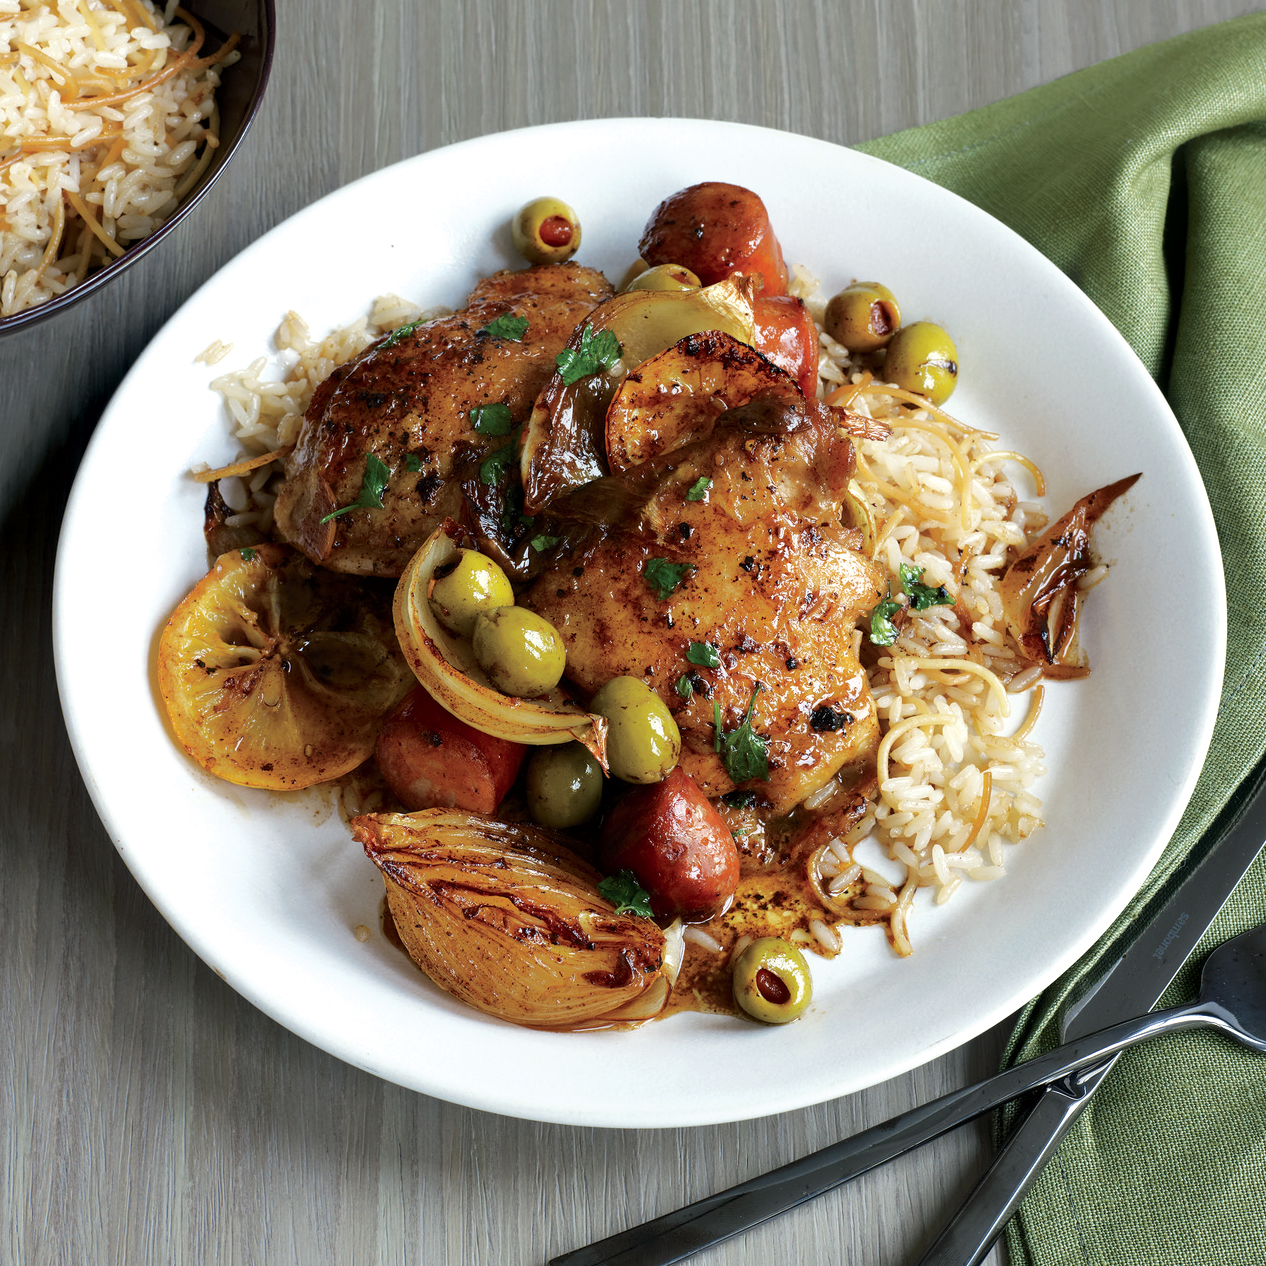 Lemon-Garlic Spanish Chicken Thighs and Rice Pilaf